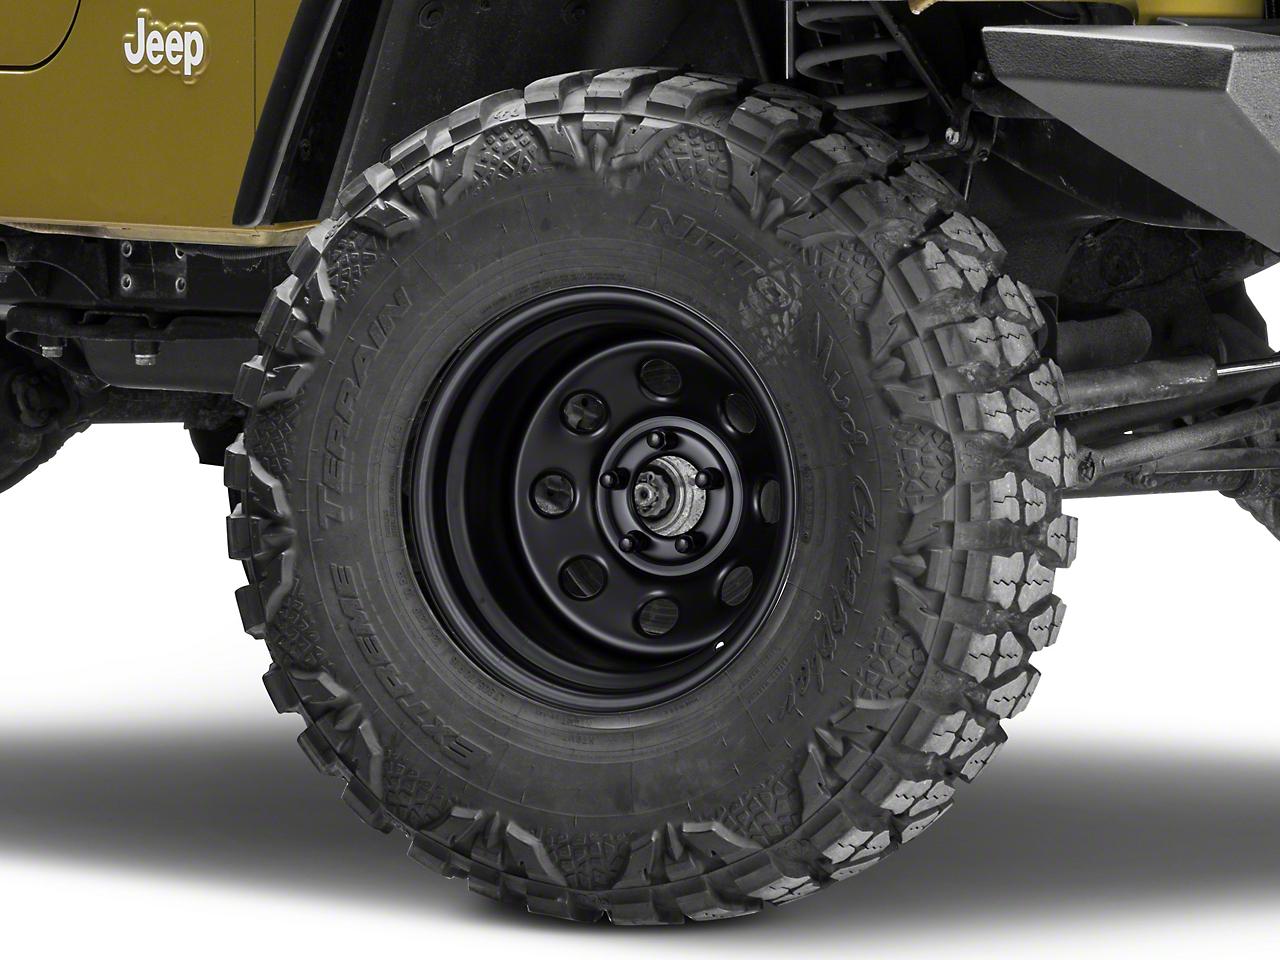 Pro Comp Steel Series 97 Rock Crawler Flat Black Wheel - 15x10 (87-06 Wrangler YJ & TJ)